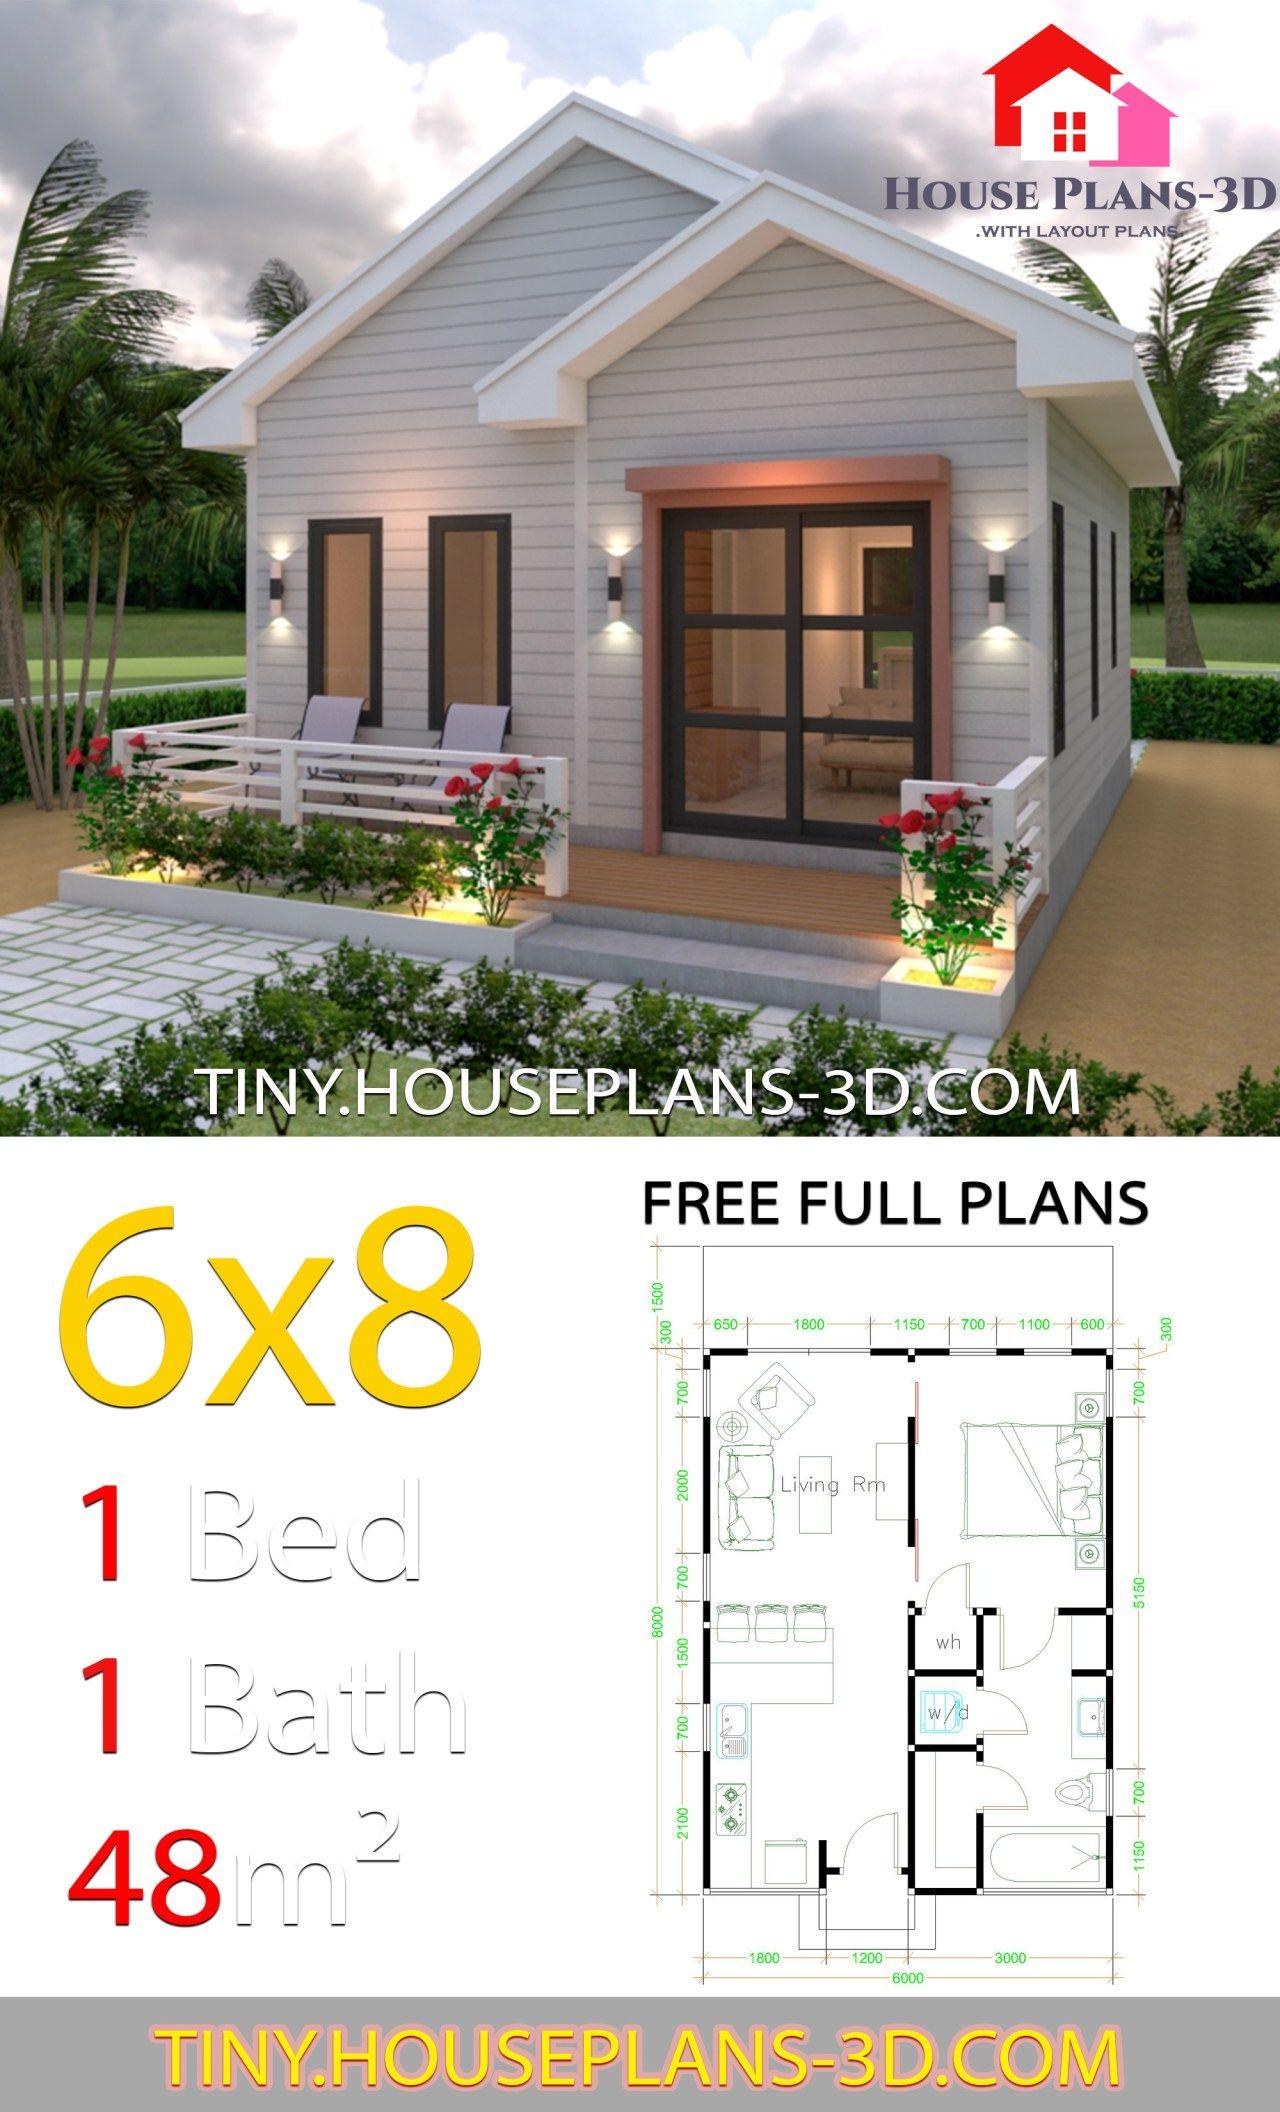 Studio House Plans 6x8 Gable Roof Tiny House Plans Simple House Plans Small House Plans Tiny House Design